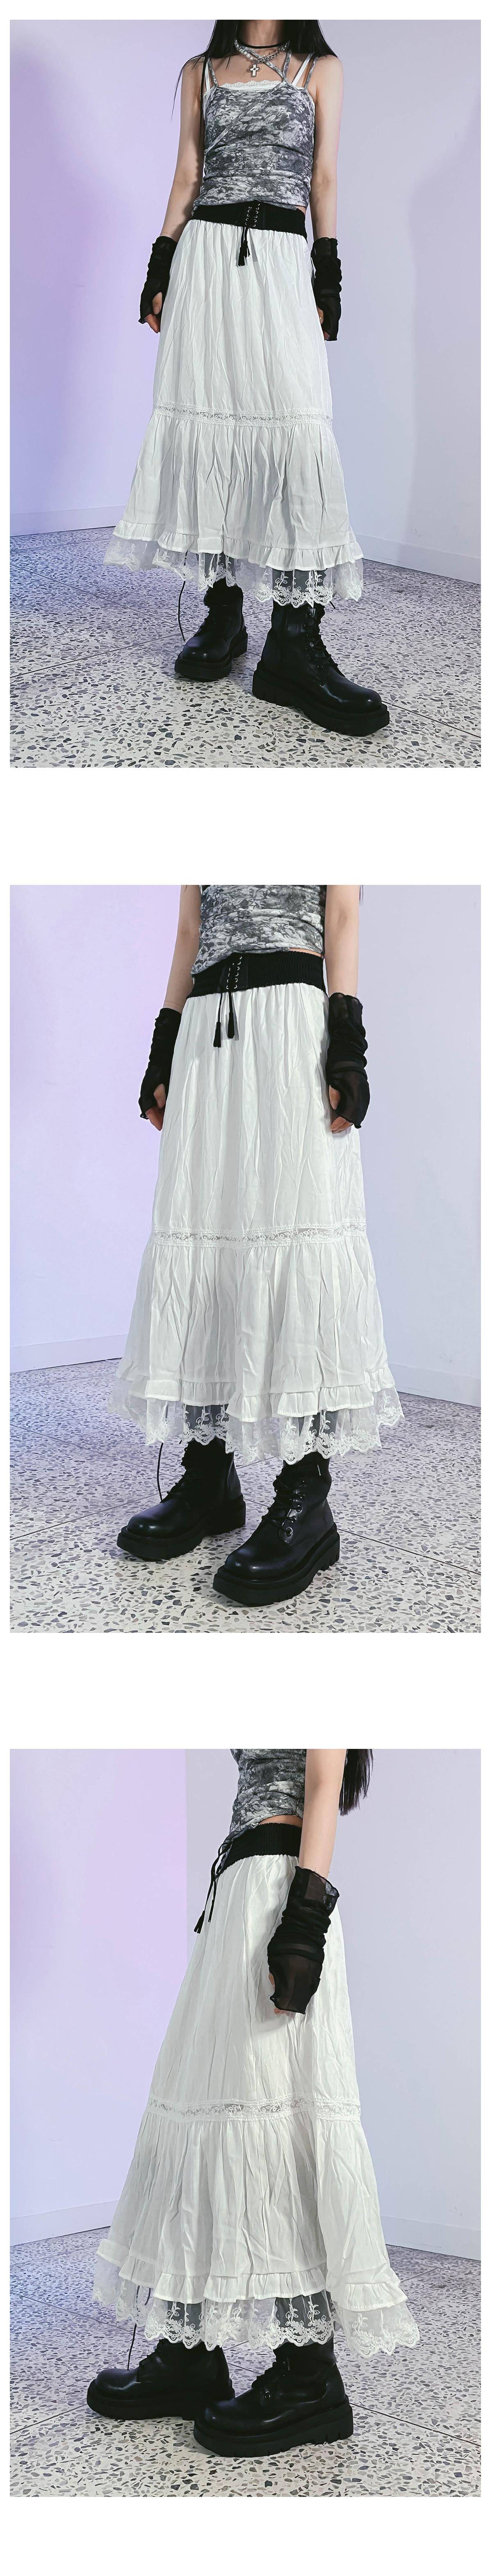 Lace eva long skirt